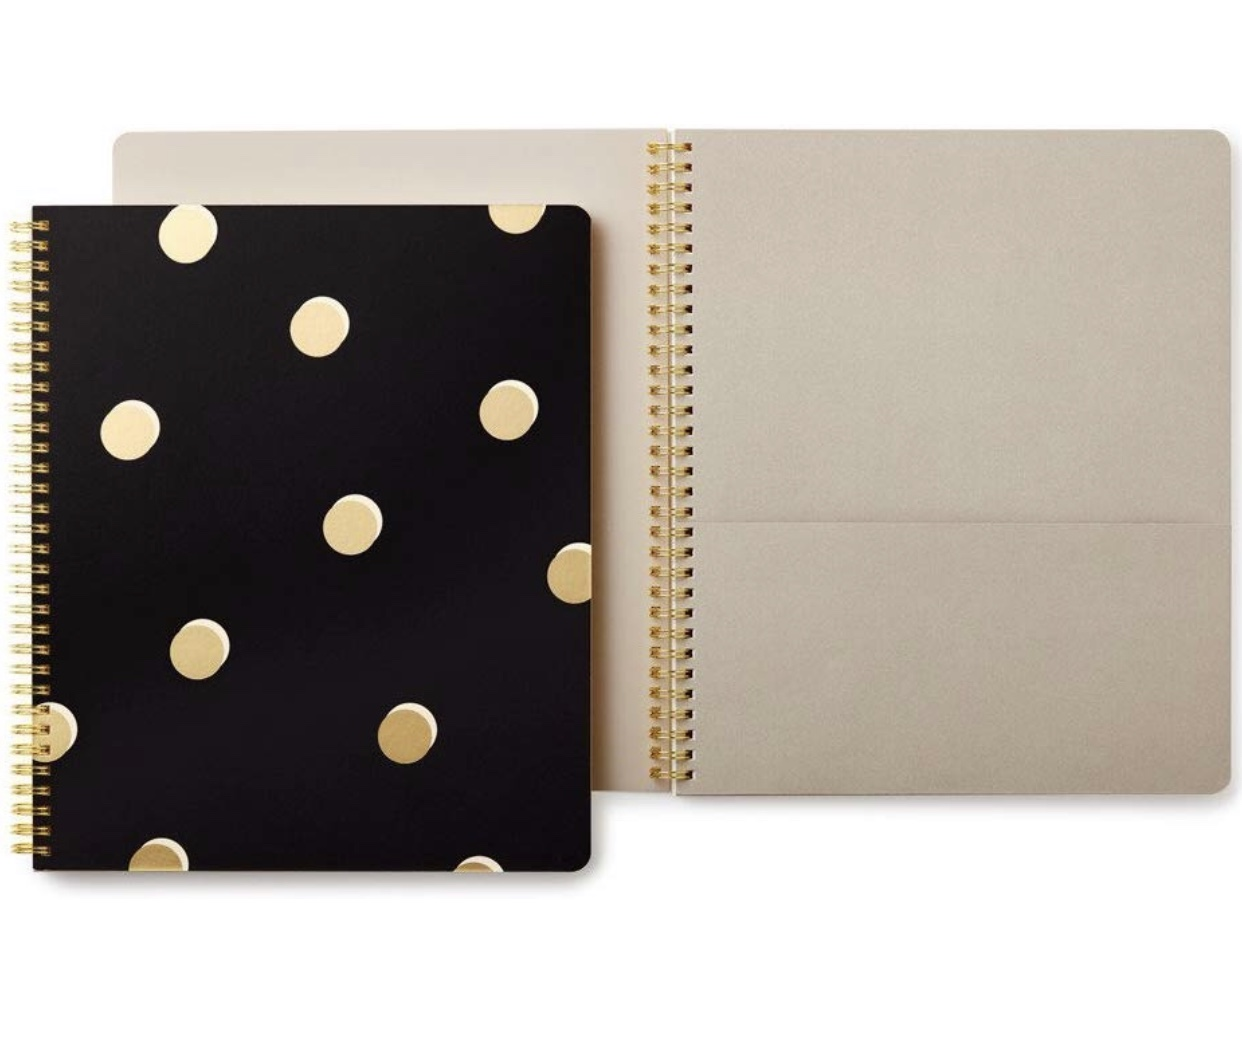 Kate Spade Spiral Bound Notebooks